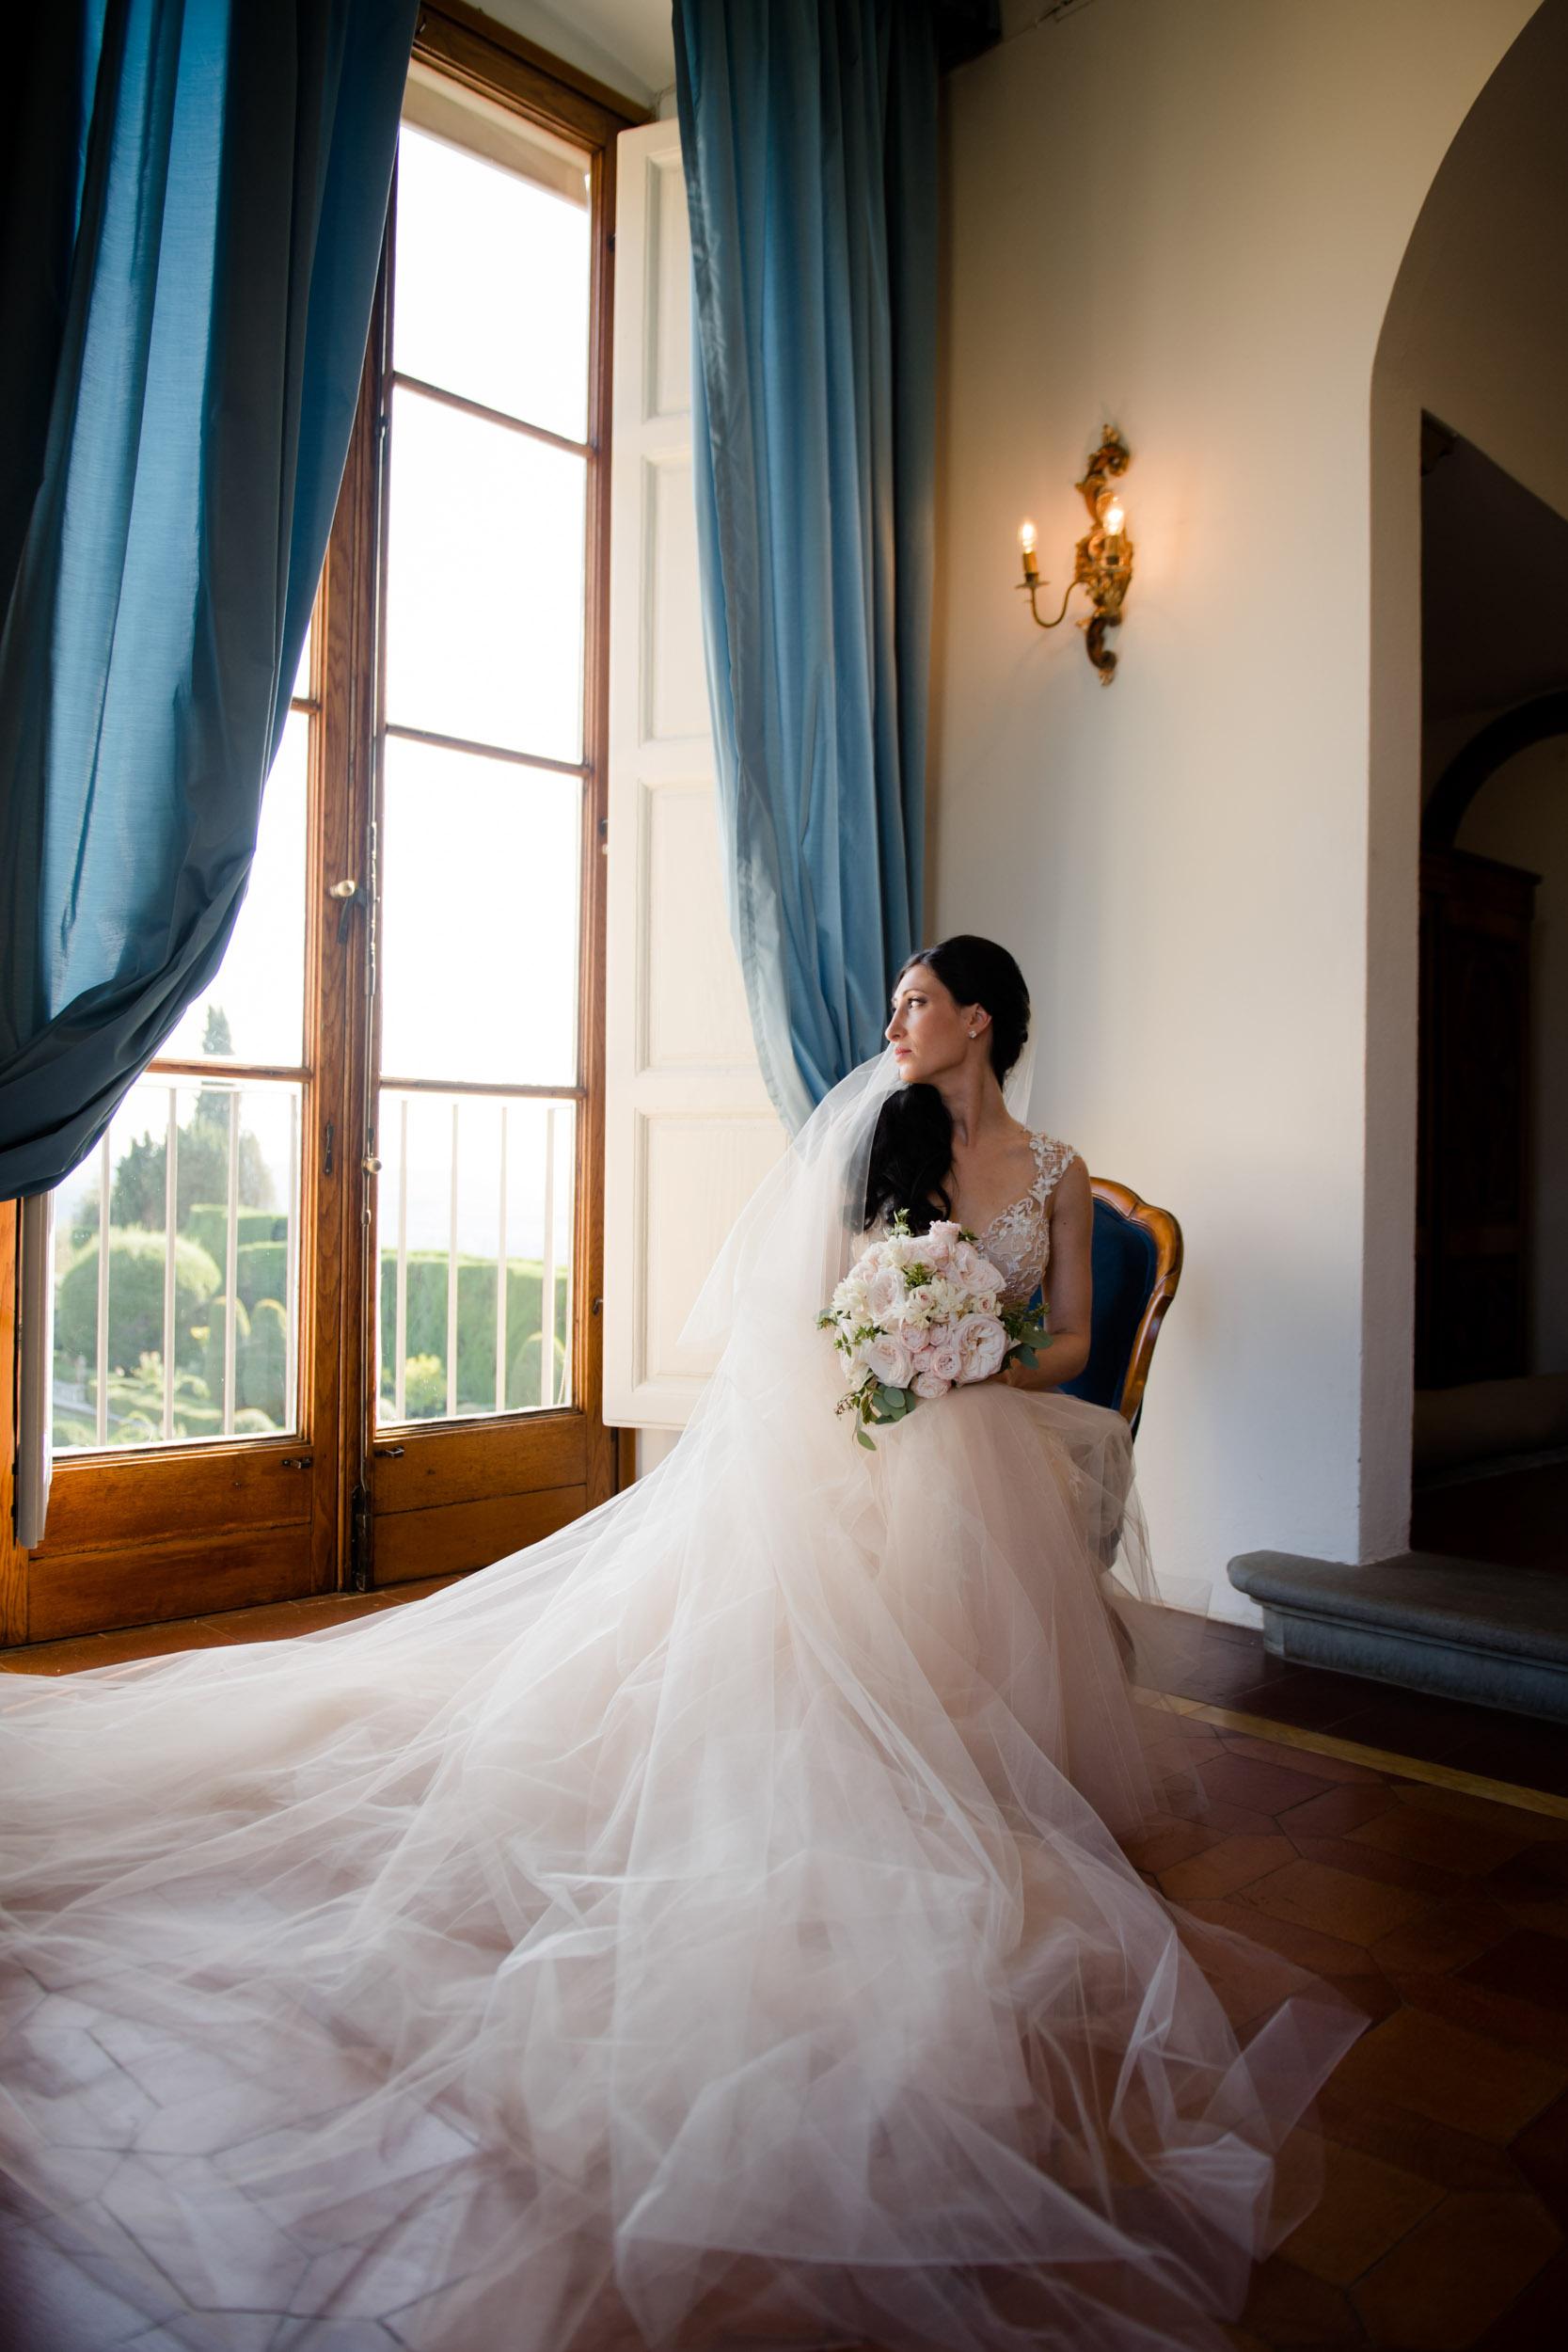 villa-gamberaia-florence-italy-destination-wedding-39.jpg